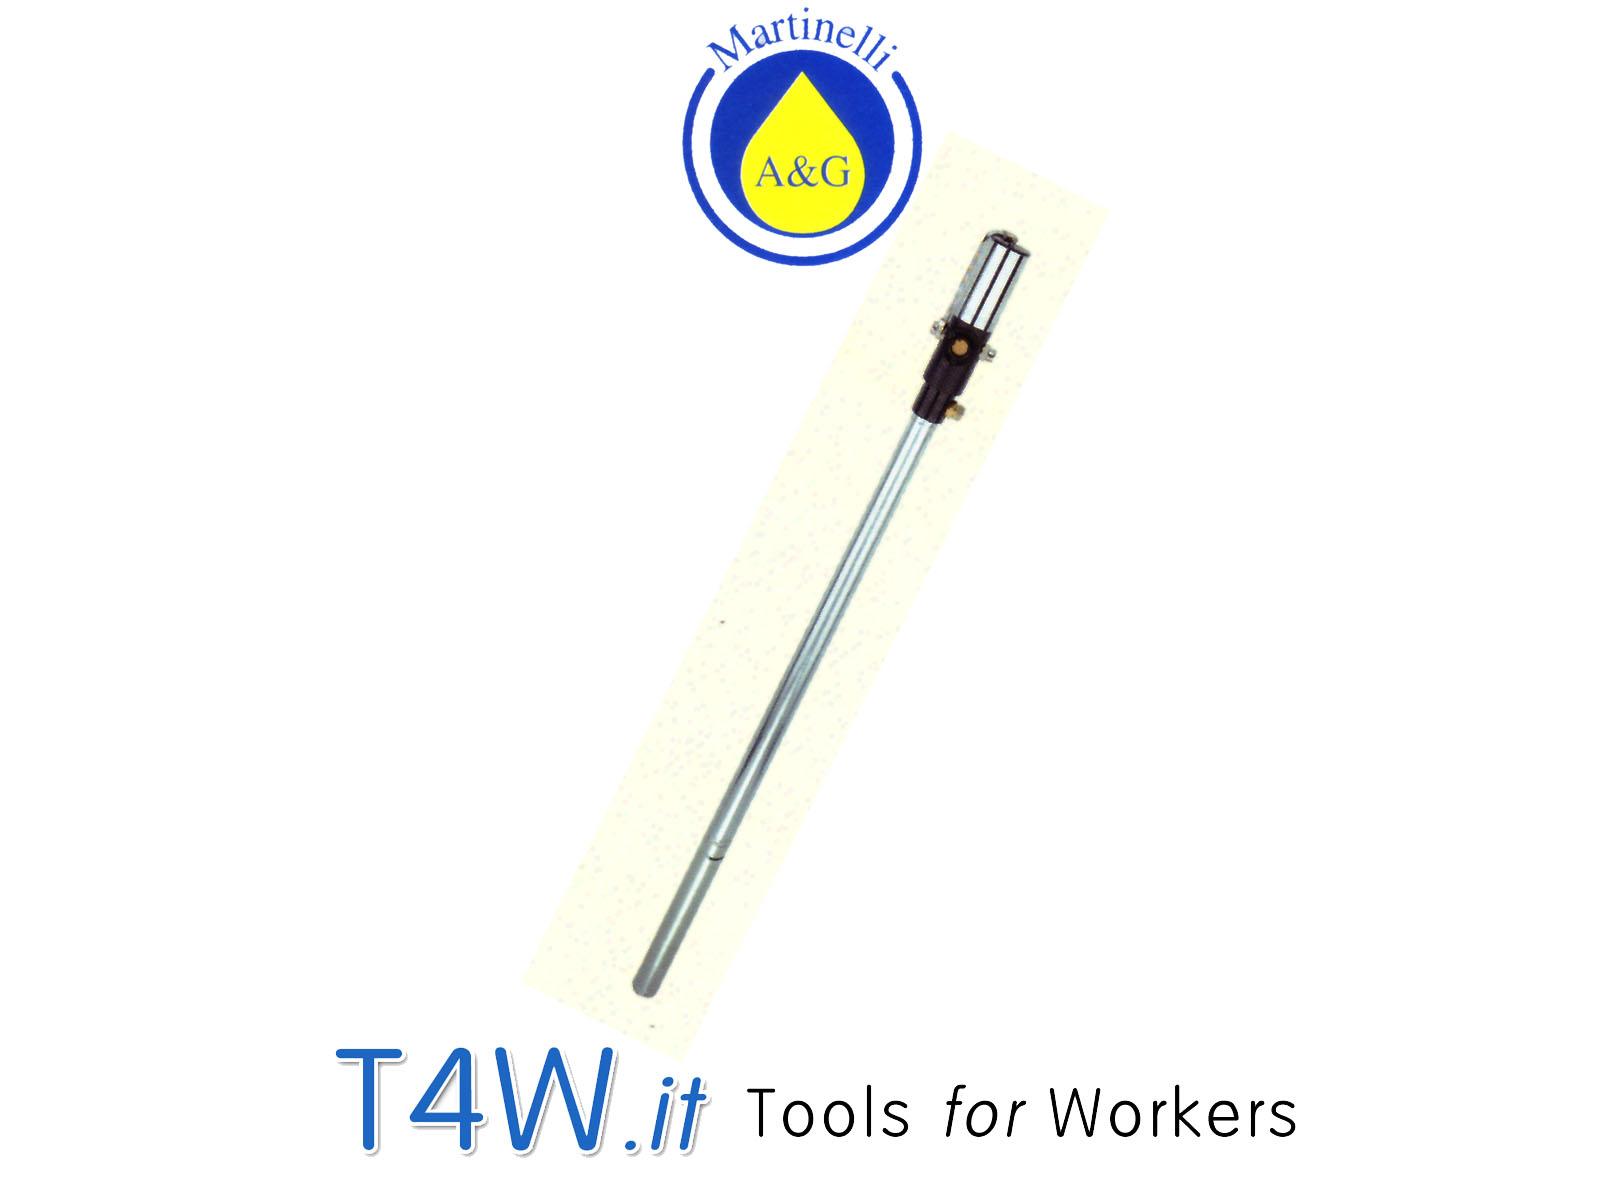 Pompa pneumatica olio per fusti kg. 200 Art. 2603 Martinelli -